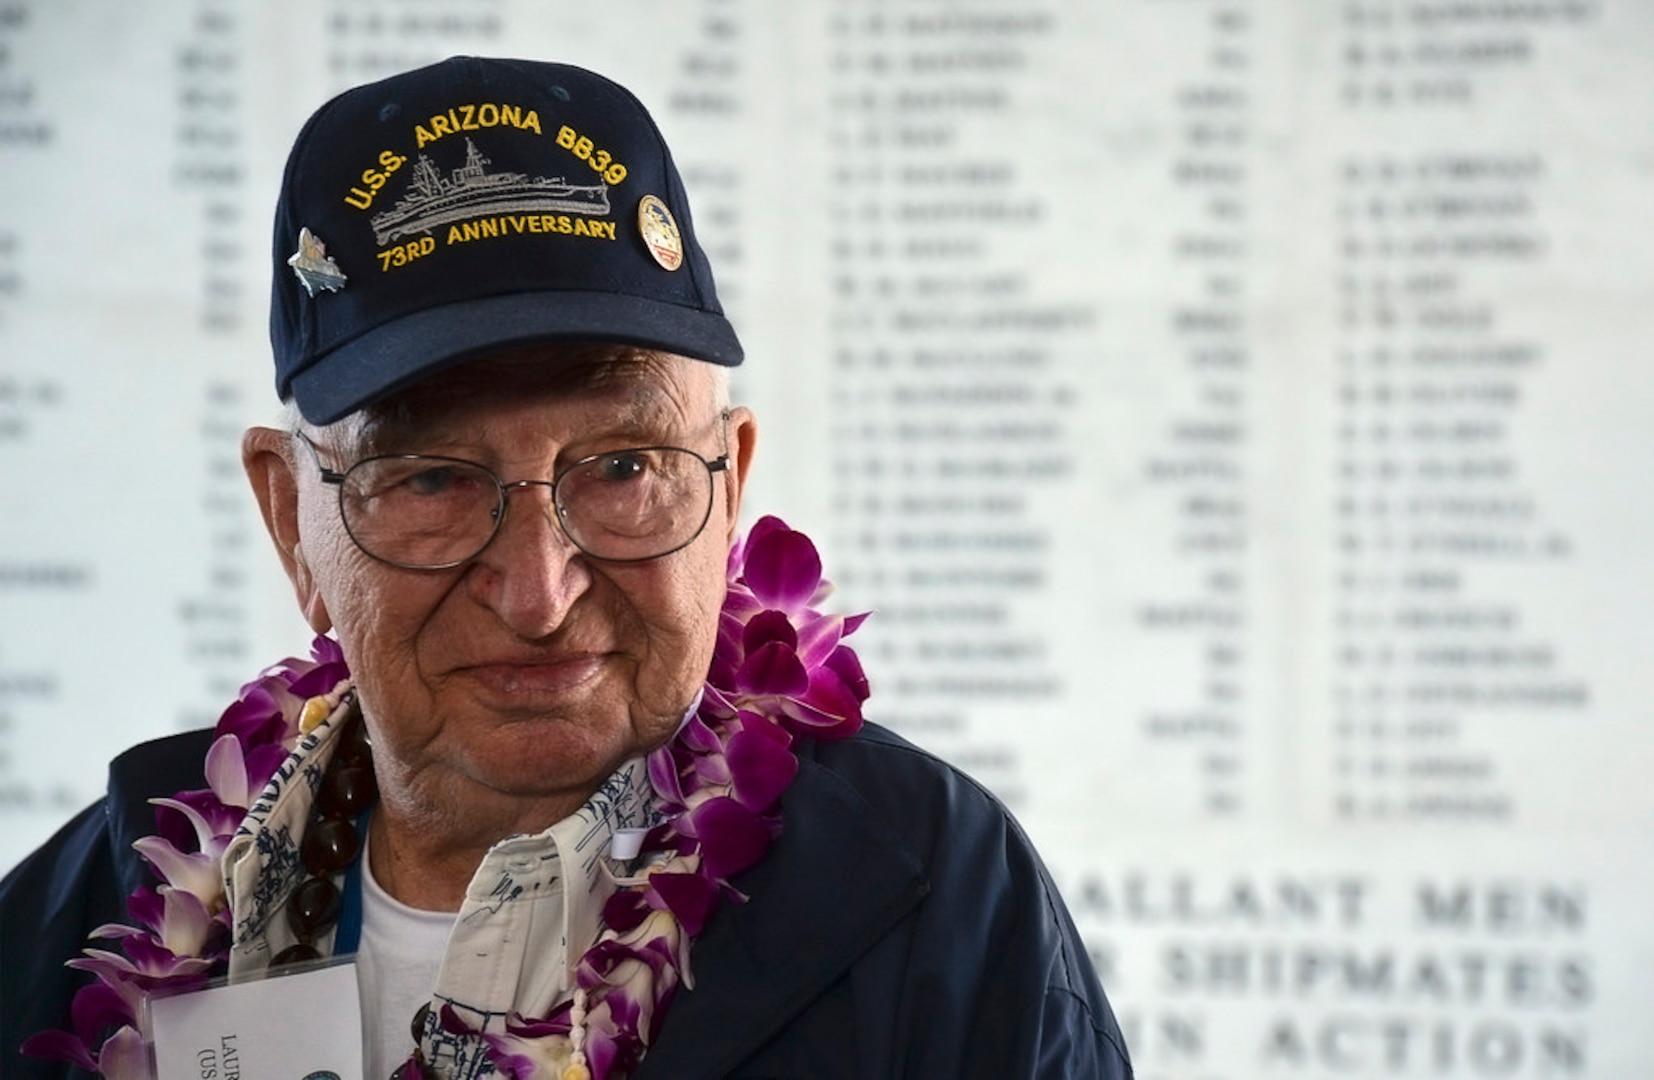 Lauren Bruner Laid to Rest among USS Arizona Shipmates